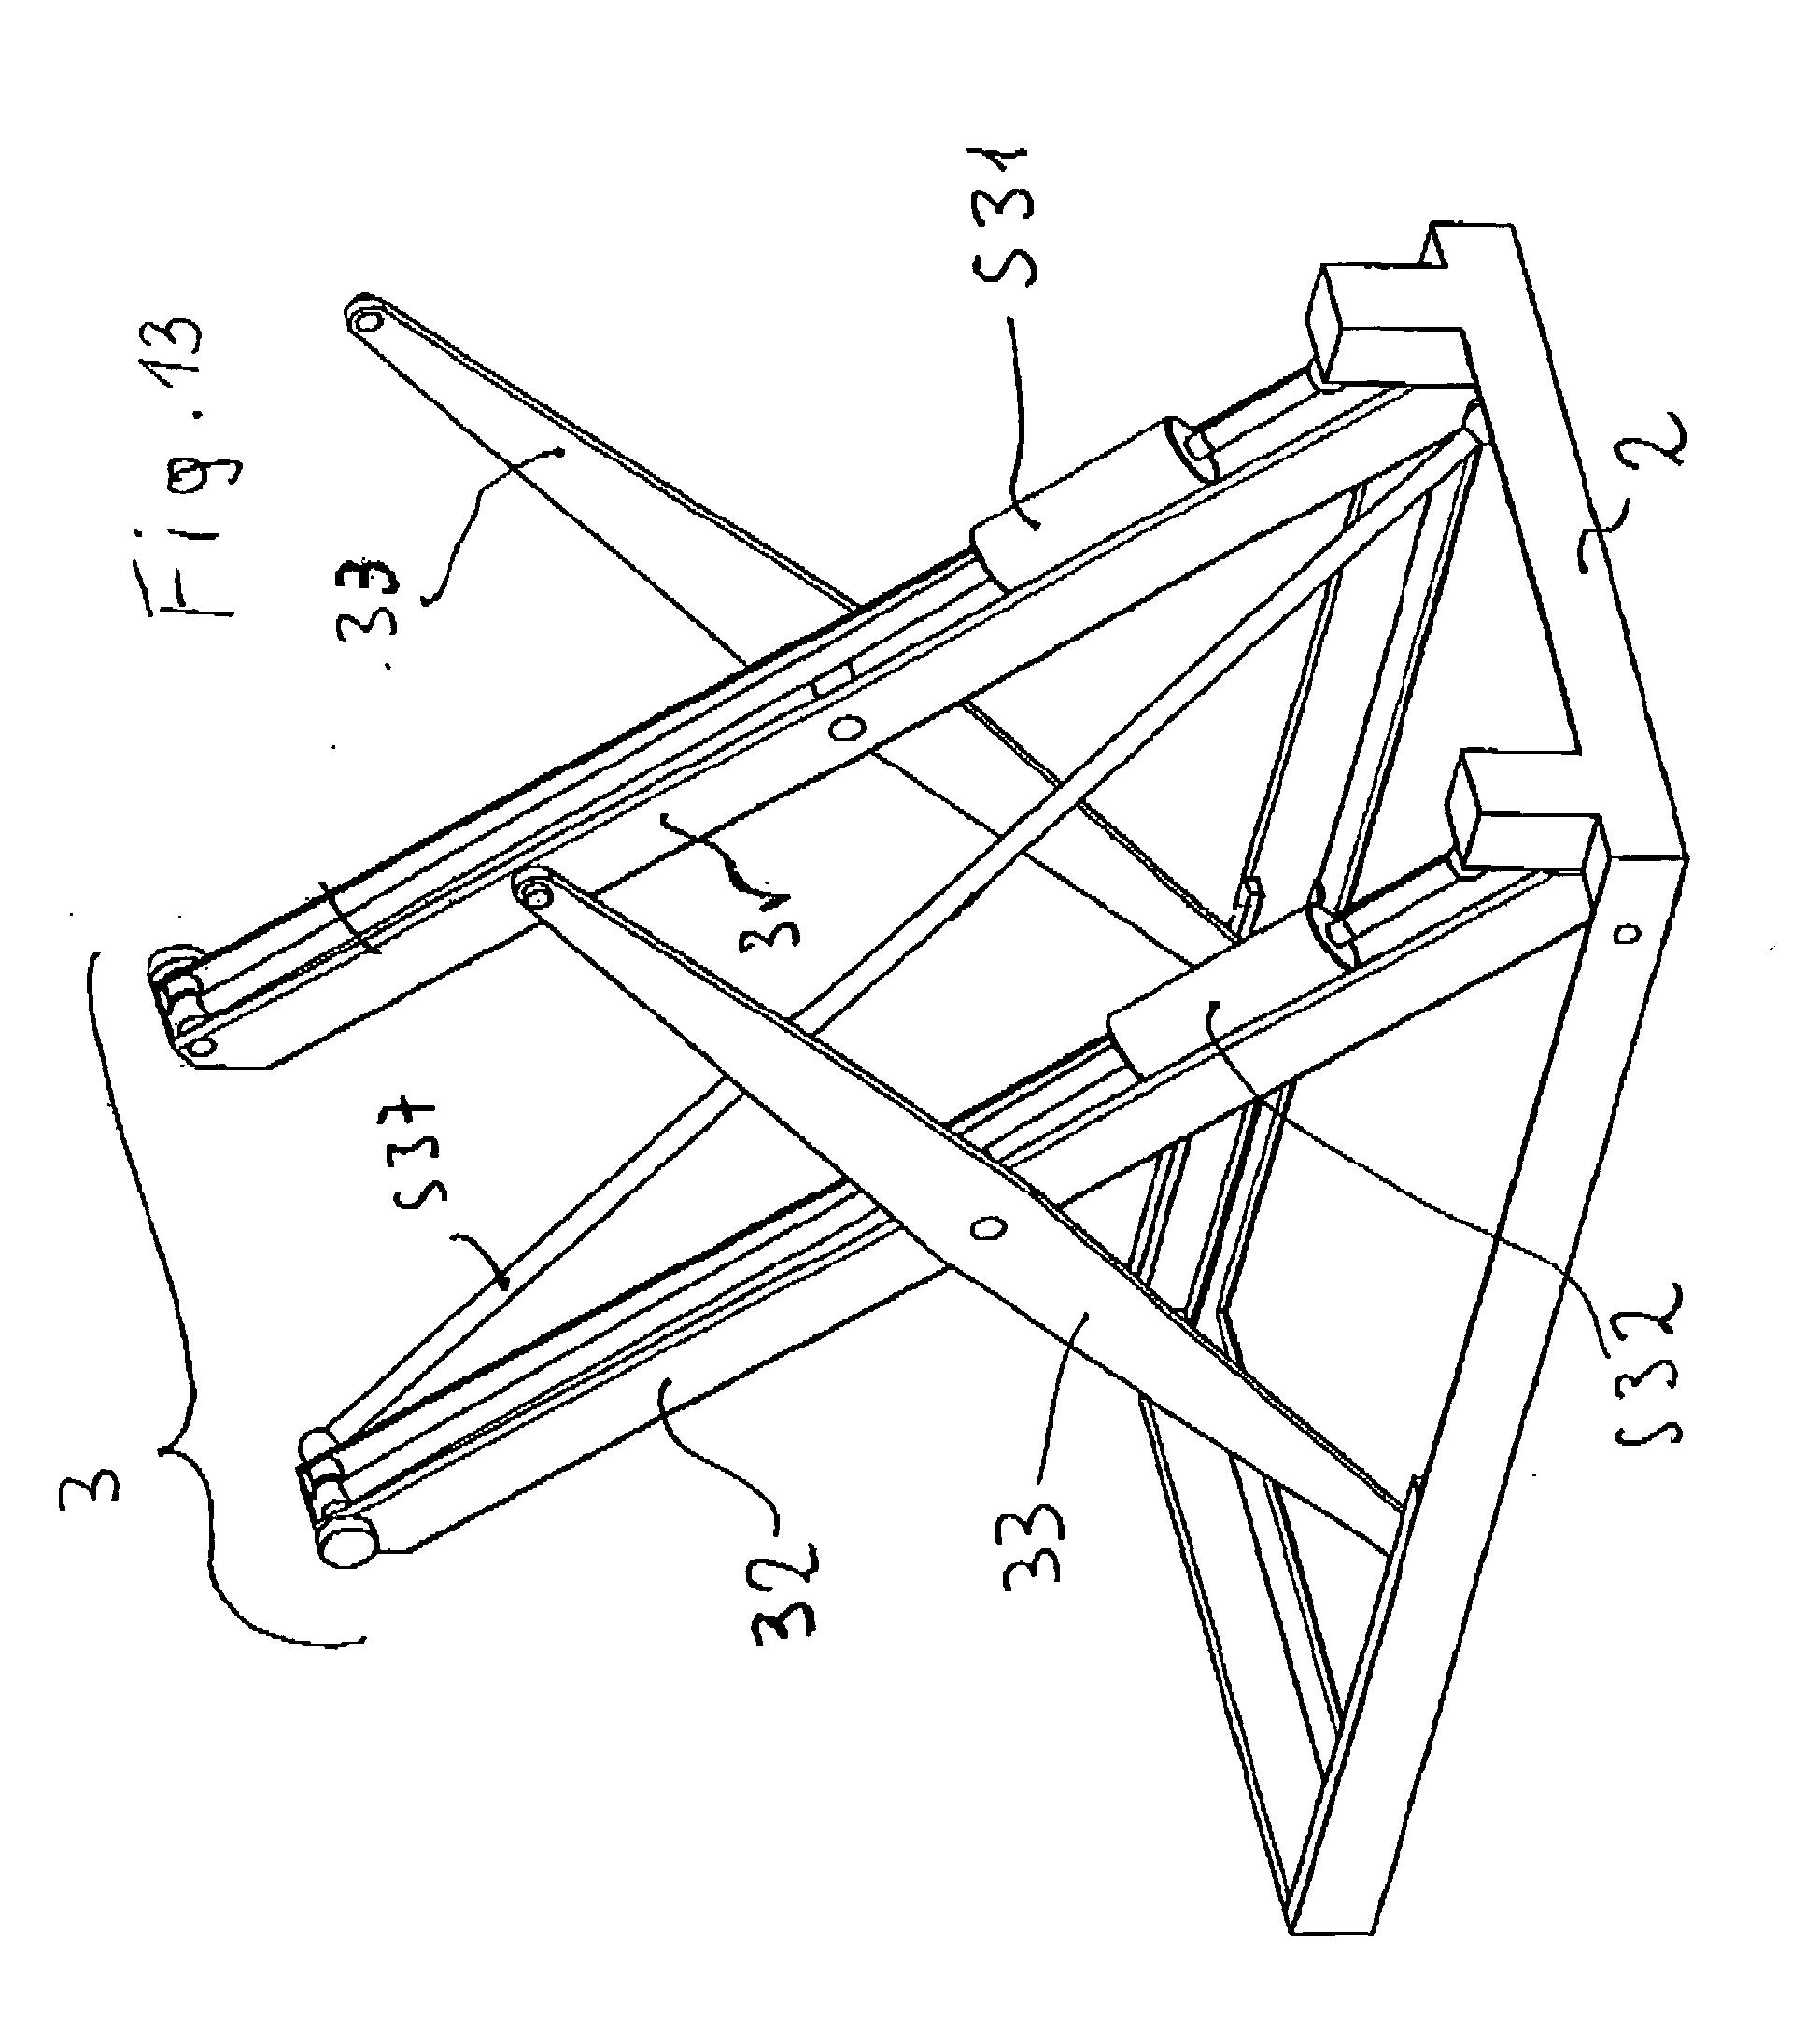 patent ep2055447b1 parallelkinematische vorrichtung google patents. Black Bedroom Furniture Sets. Home Design Ideas